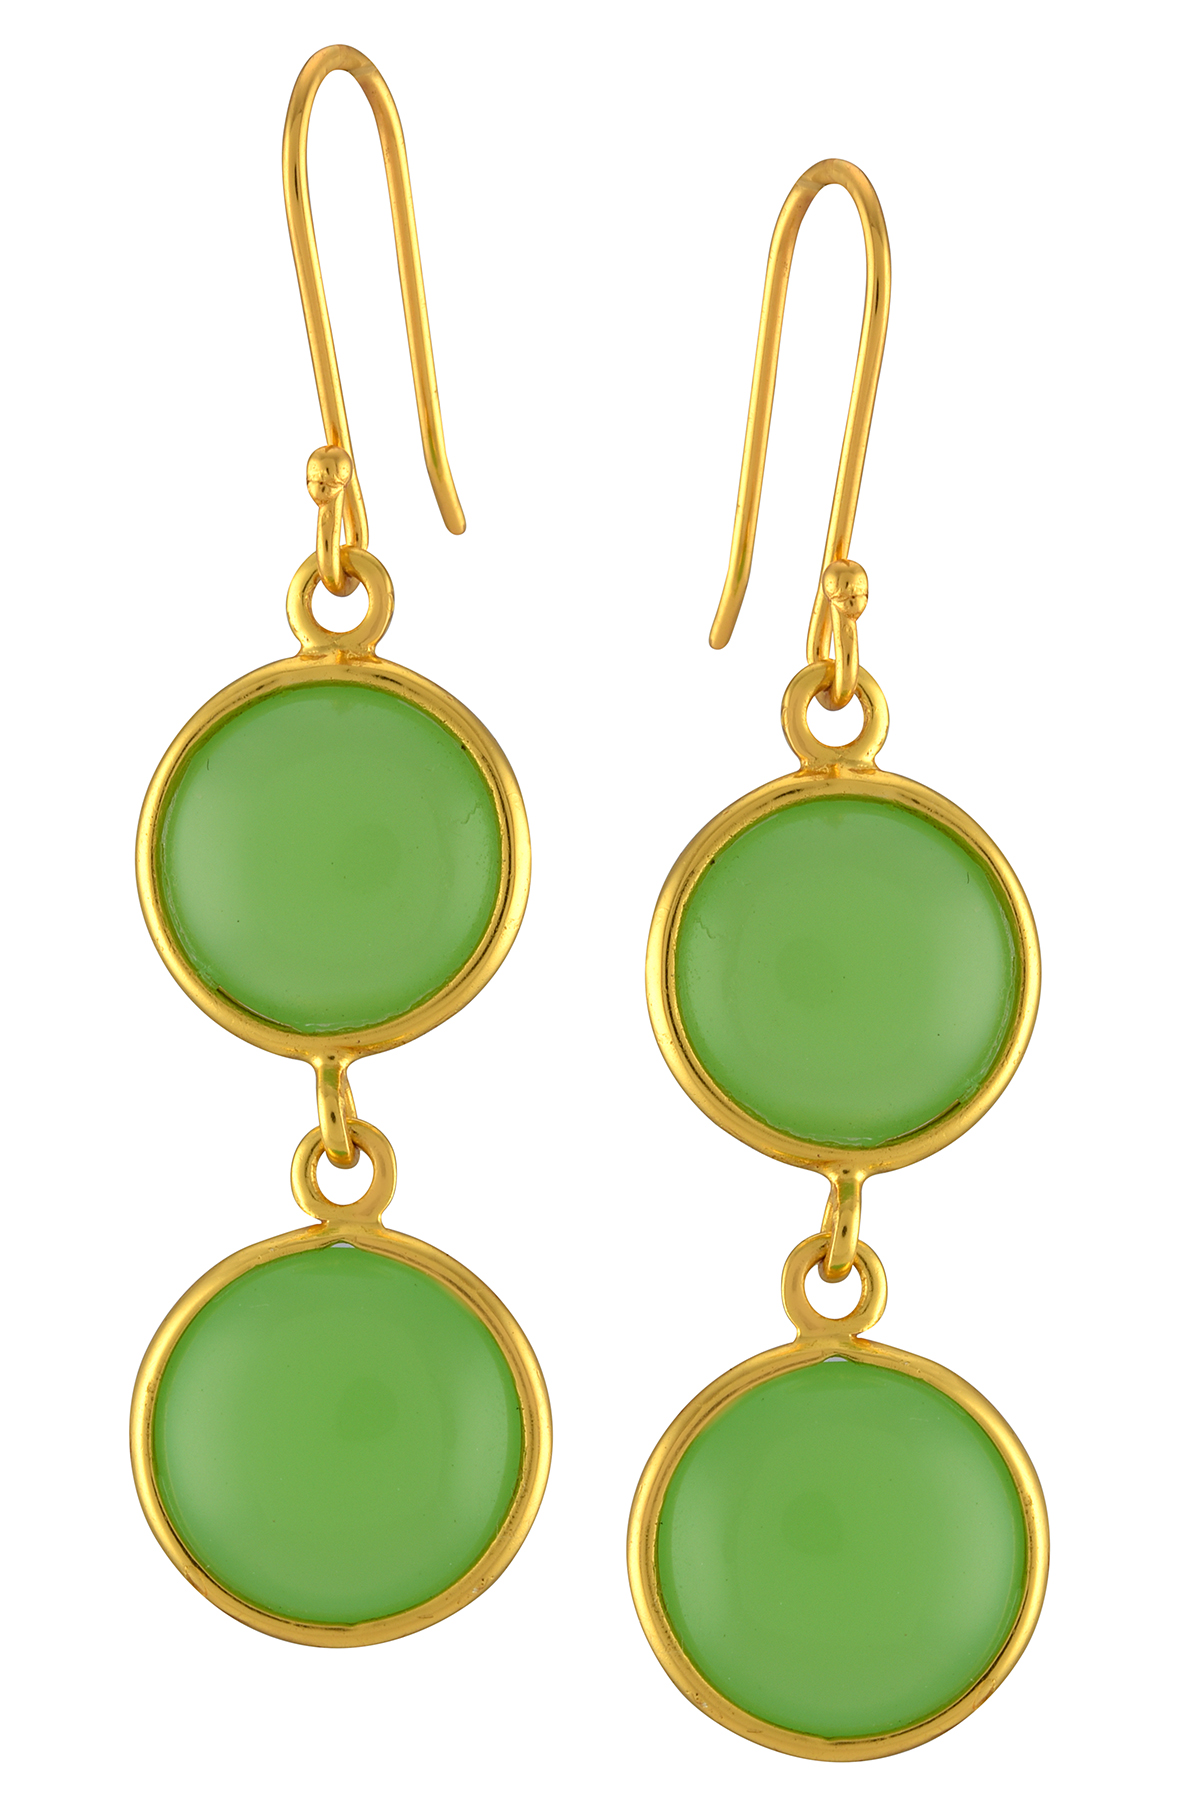 Green Glass Round Double Drop Earrings